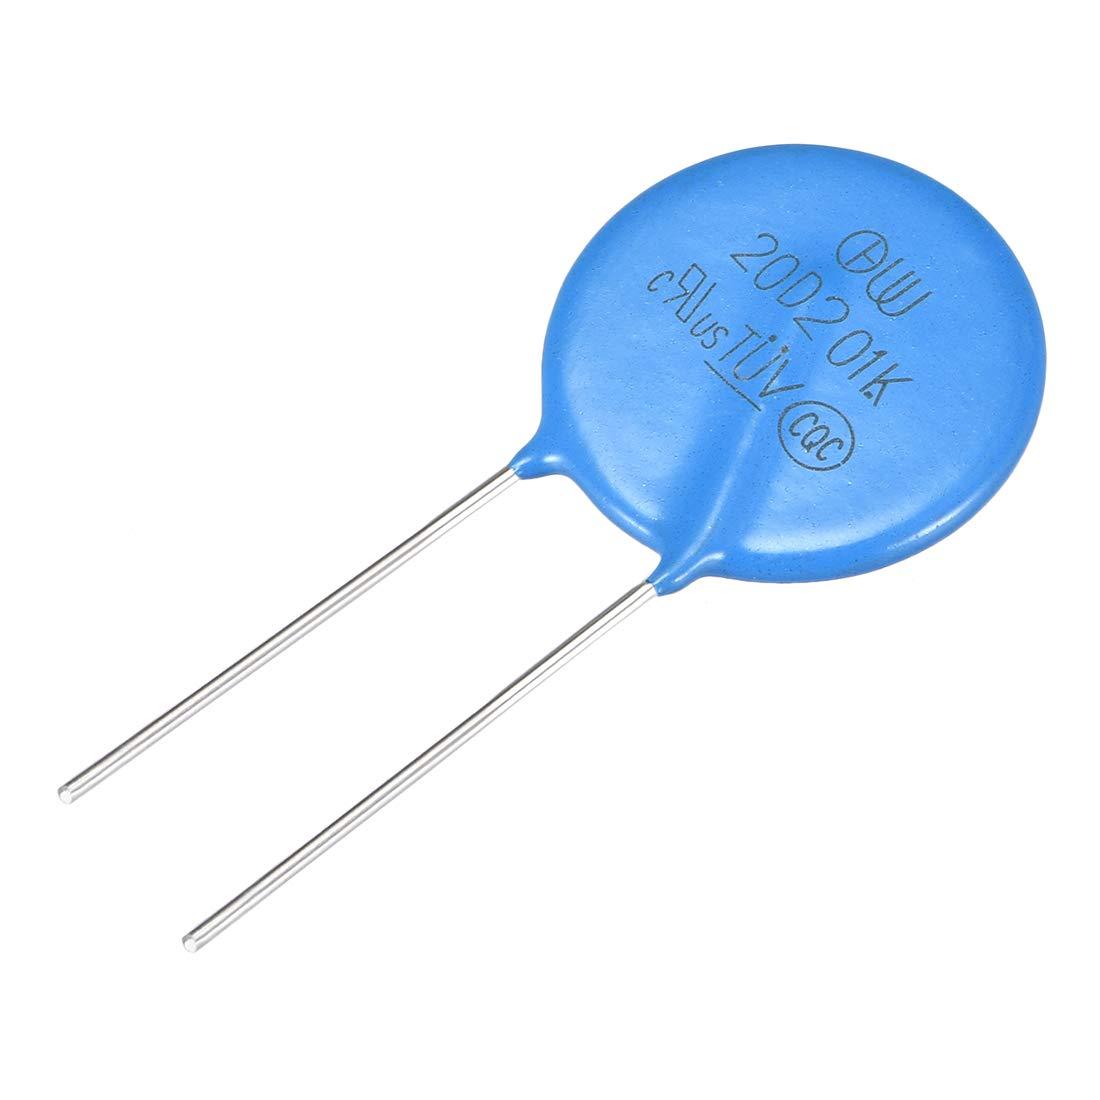 uxcell 10Pcs Voltage Dependent Resistors AC 25V 7D390K Radial Lead Disc Varistors